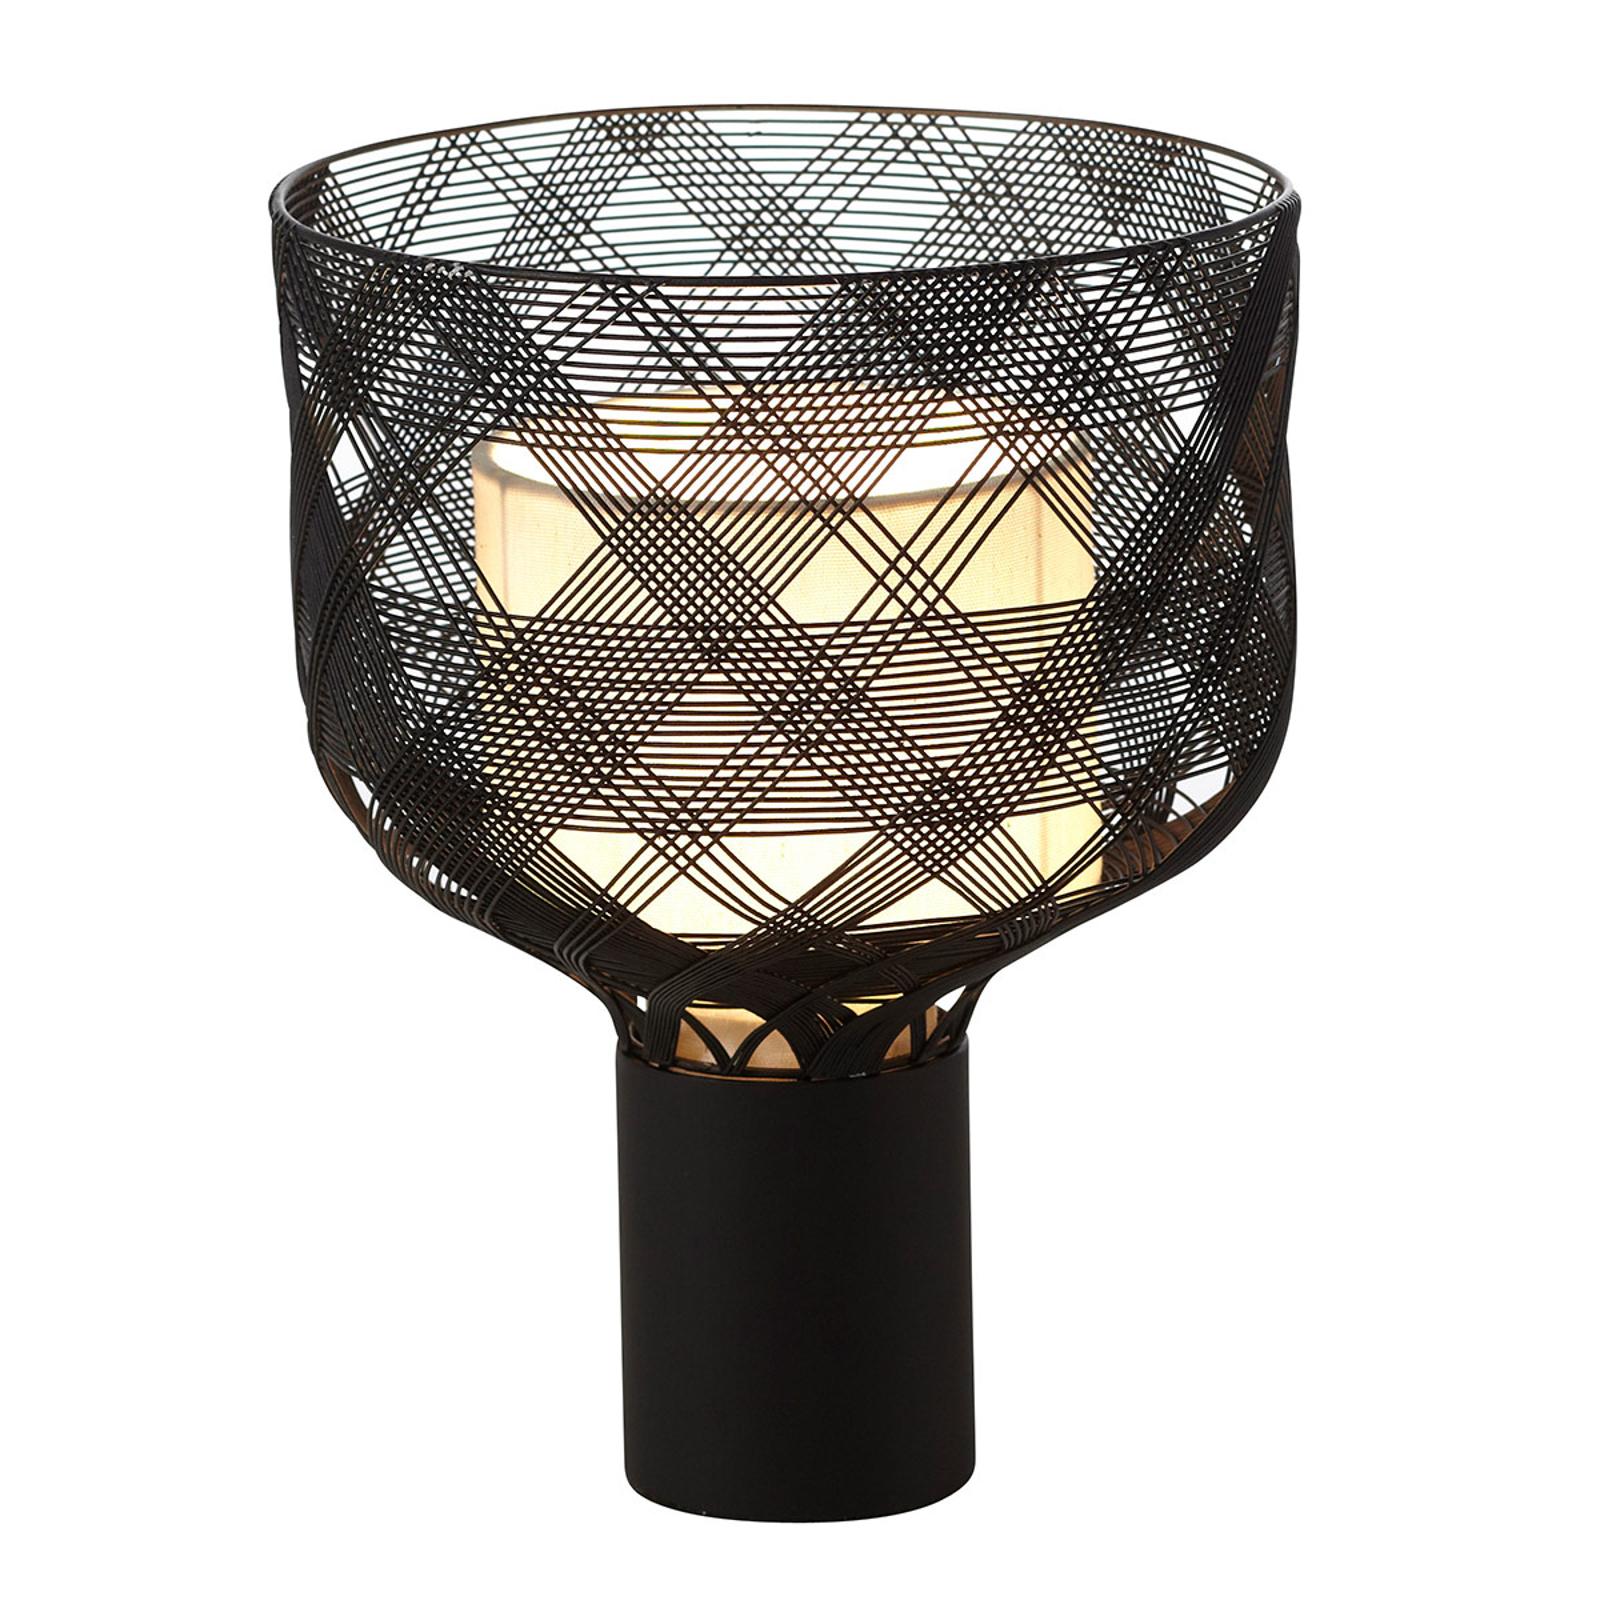 Forestier Antenna S bordlampe 20 cm, sort